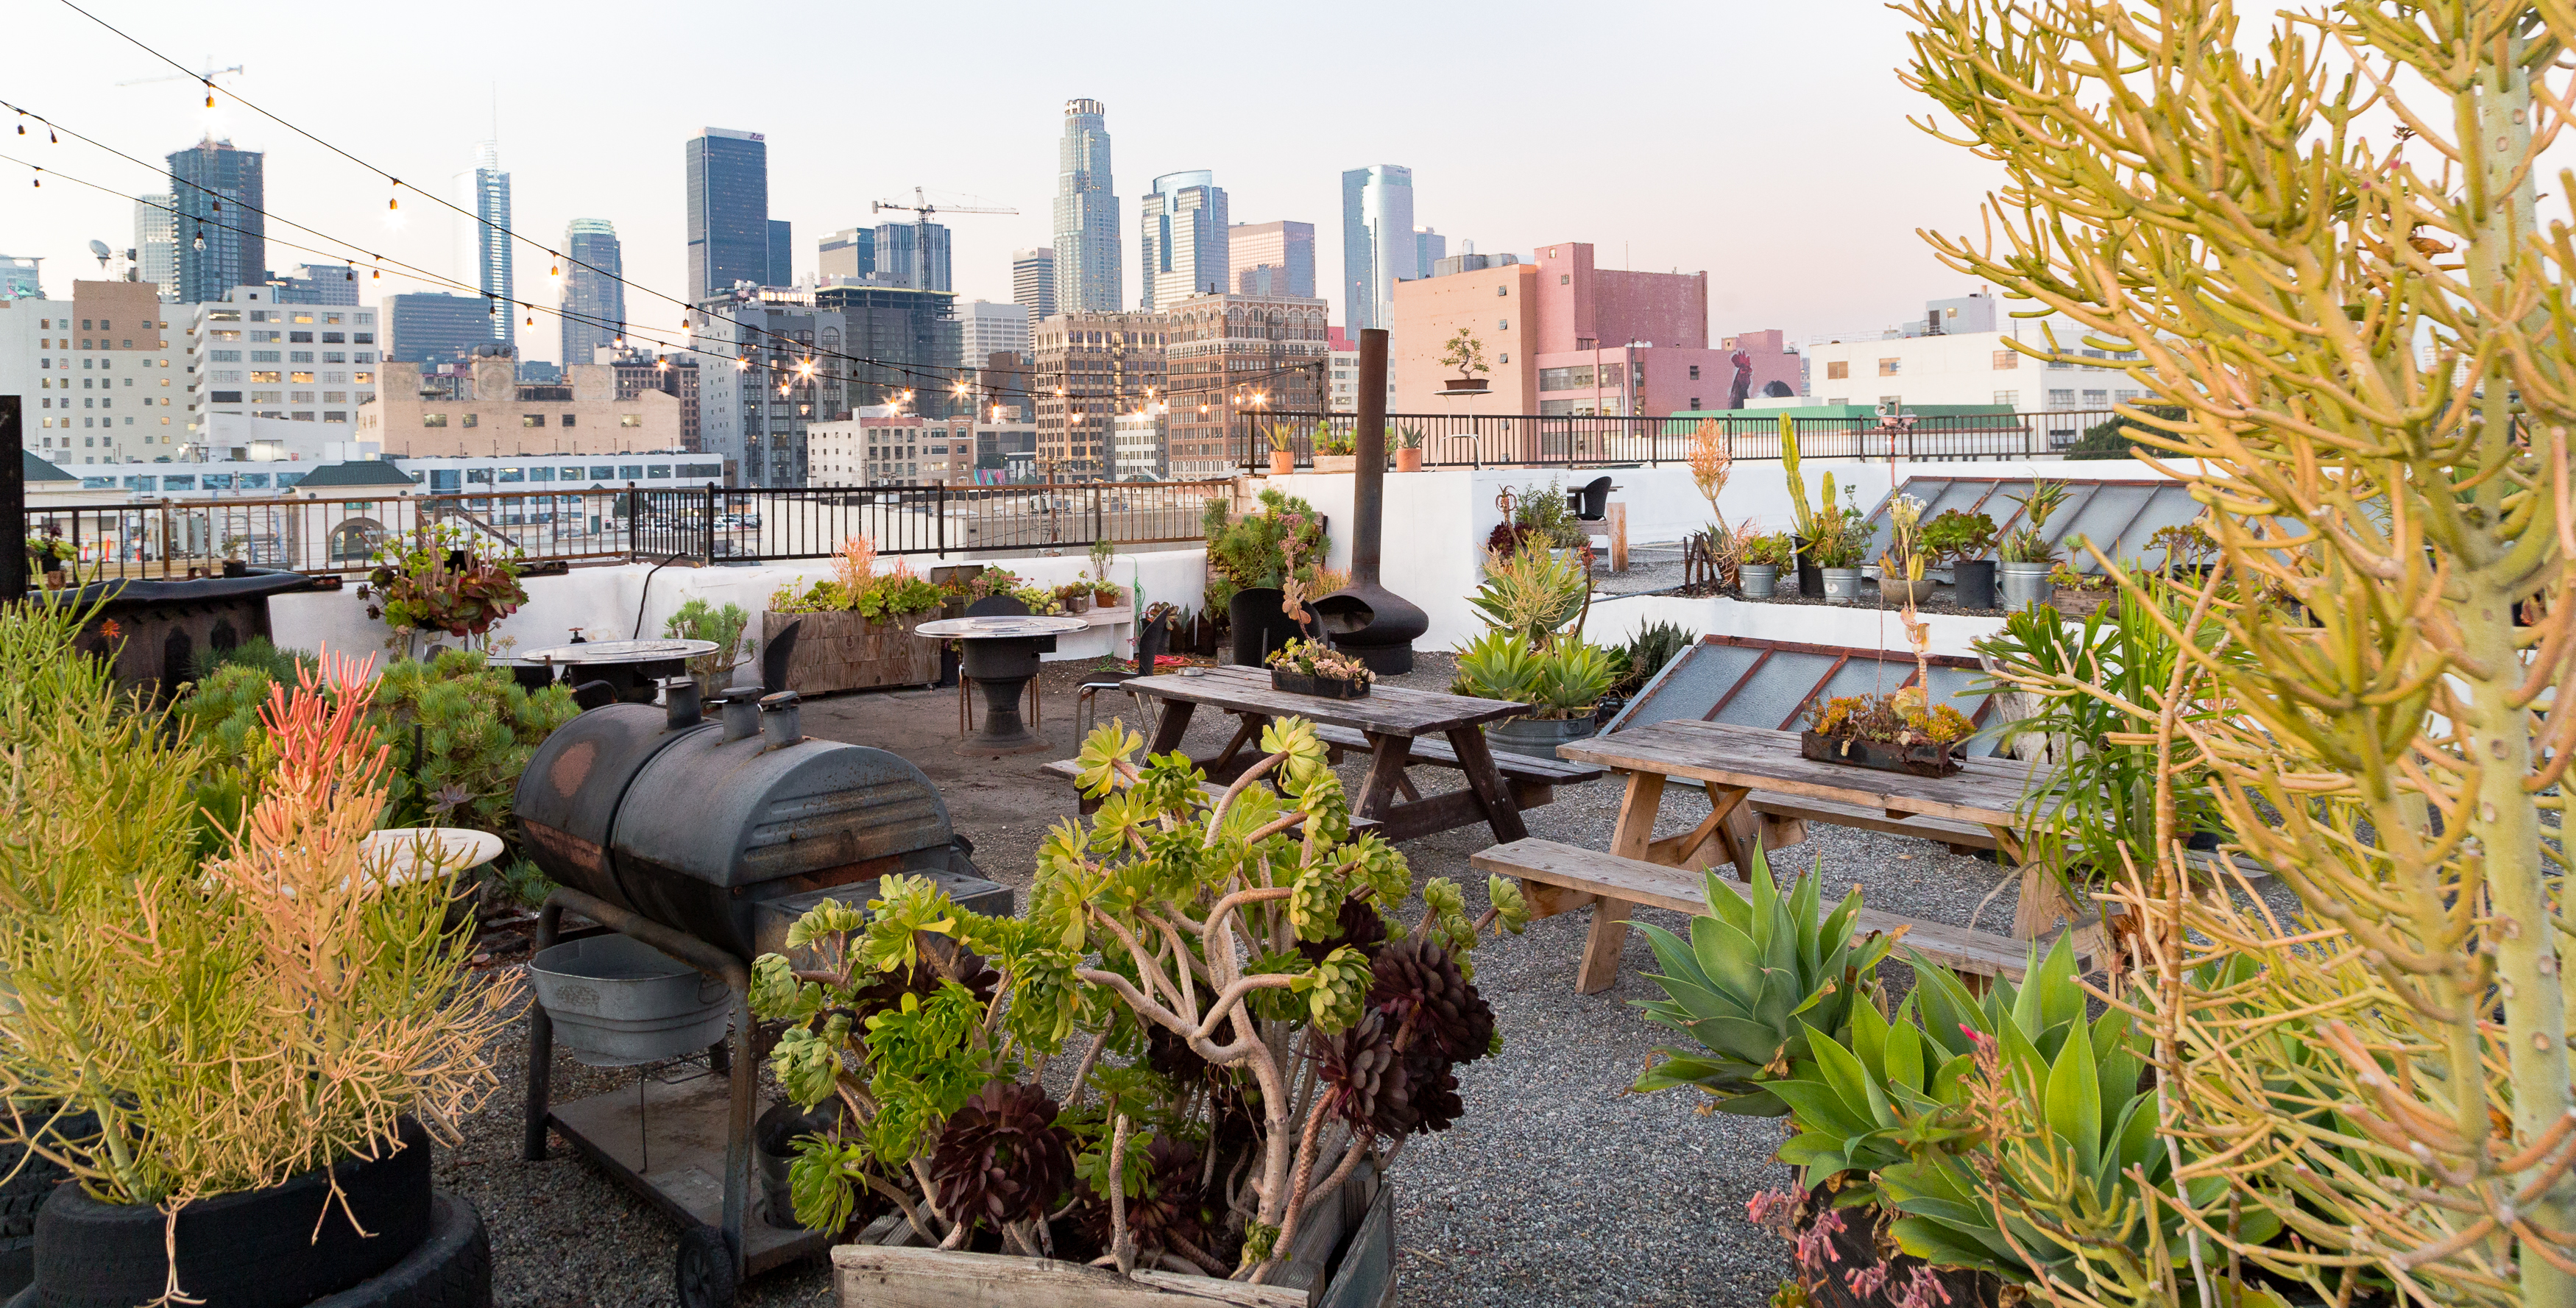 500px_peerspace_photoshoot_LA_rooftop